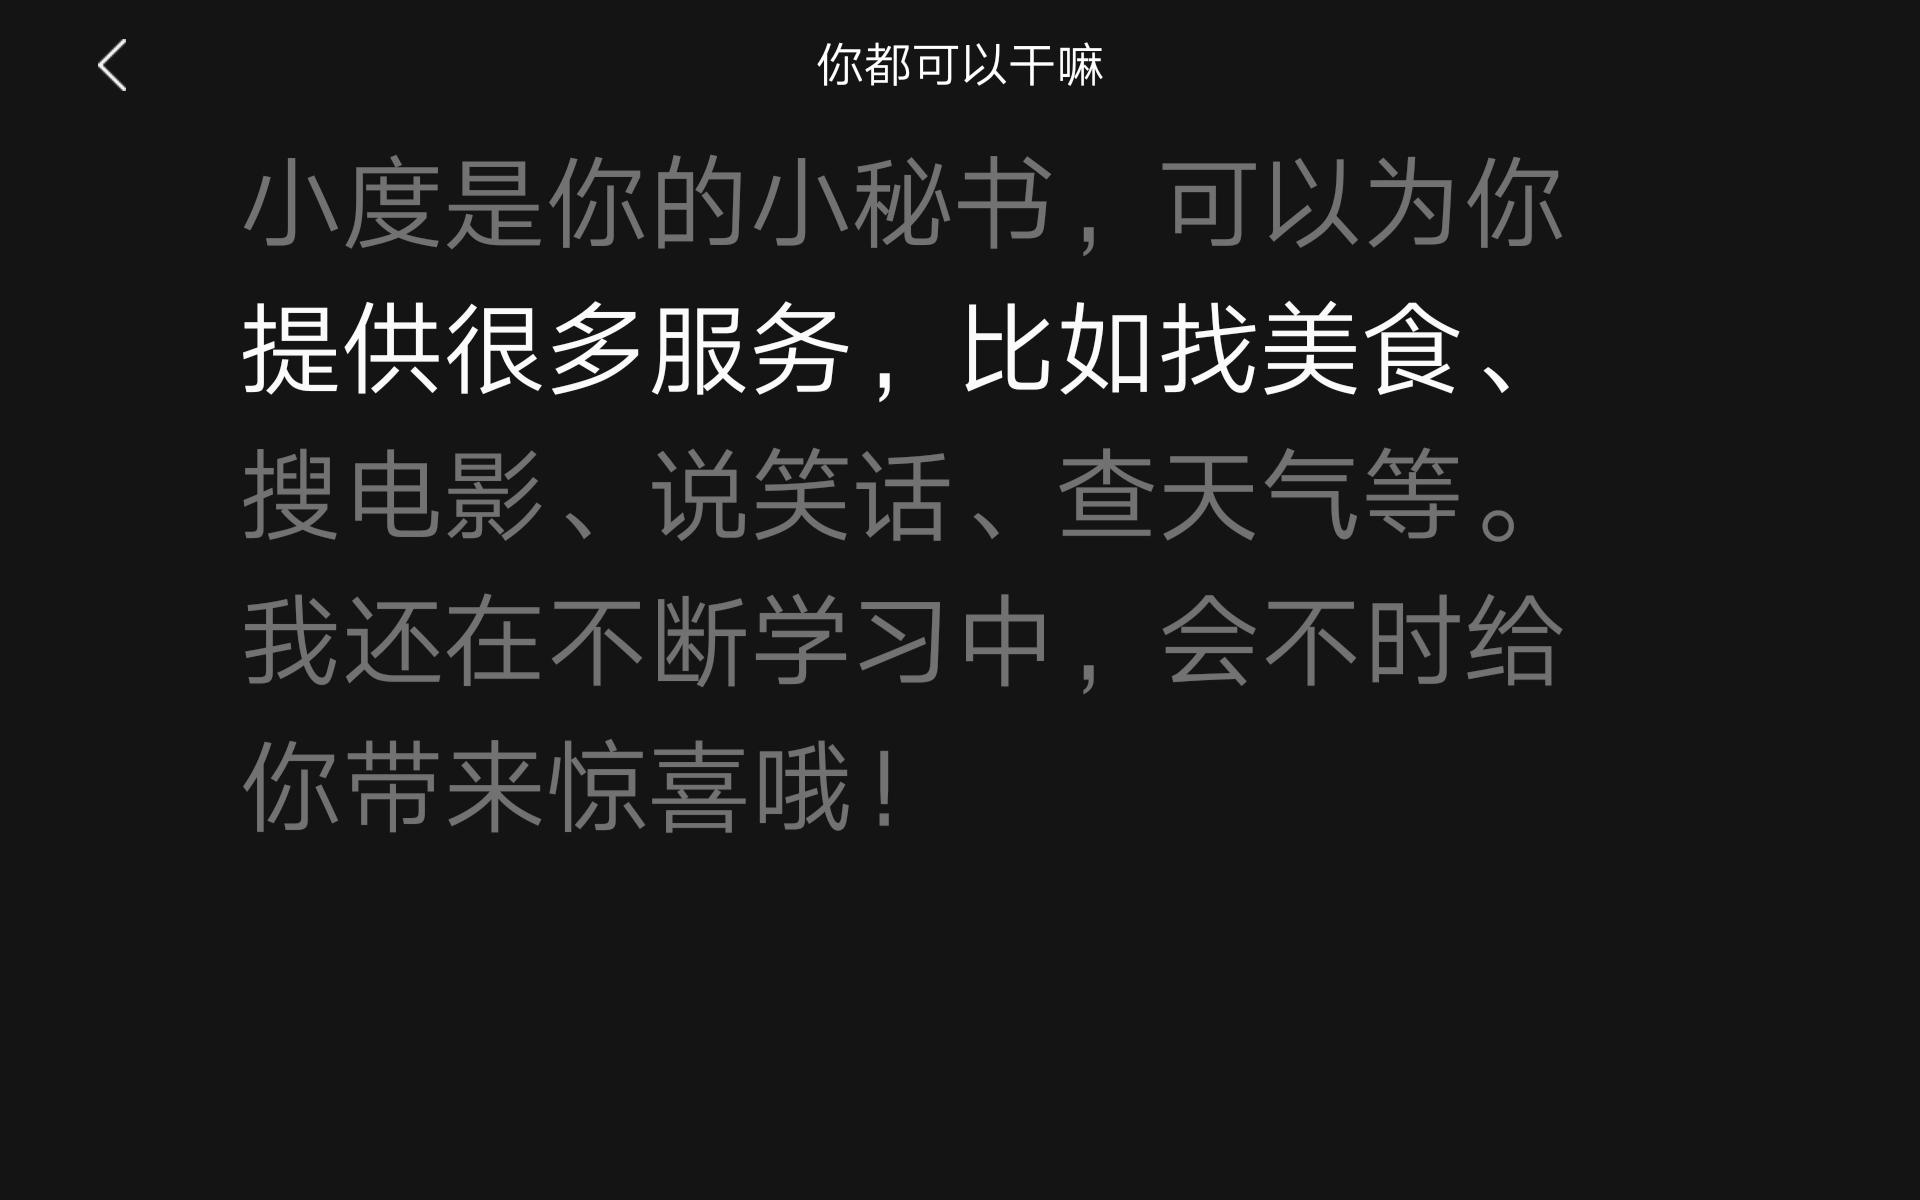 Screenshot_20190421_001104_com.baidu.launcher.jpg